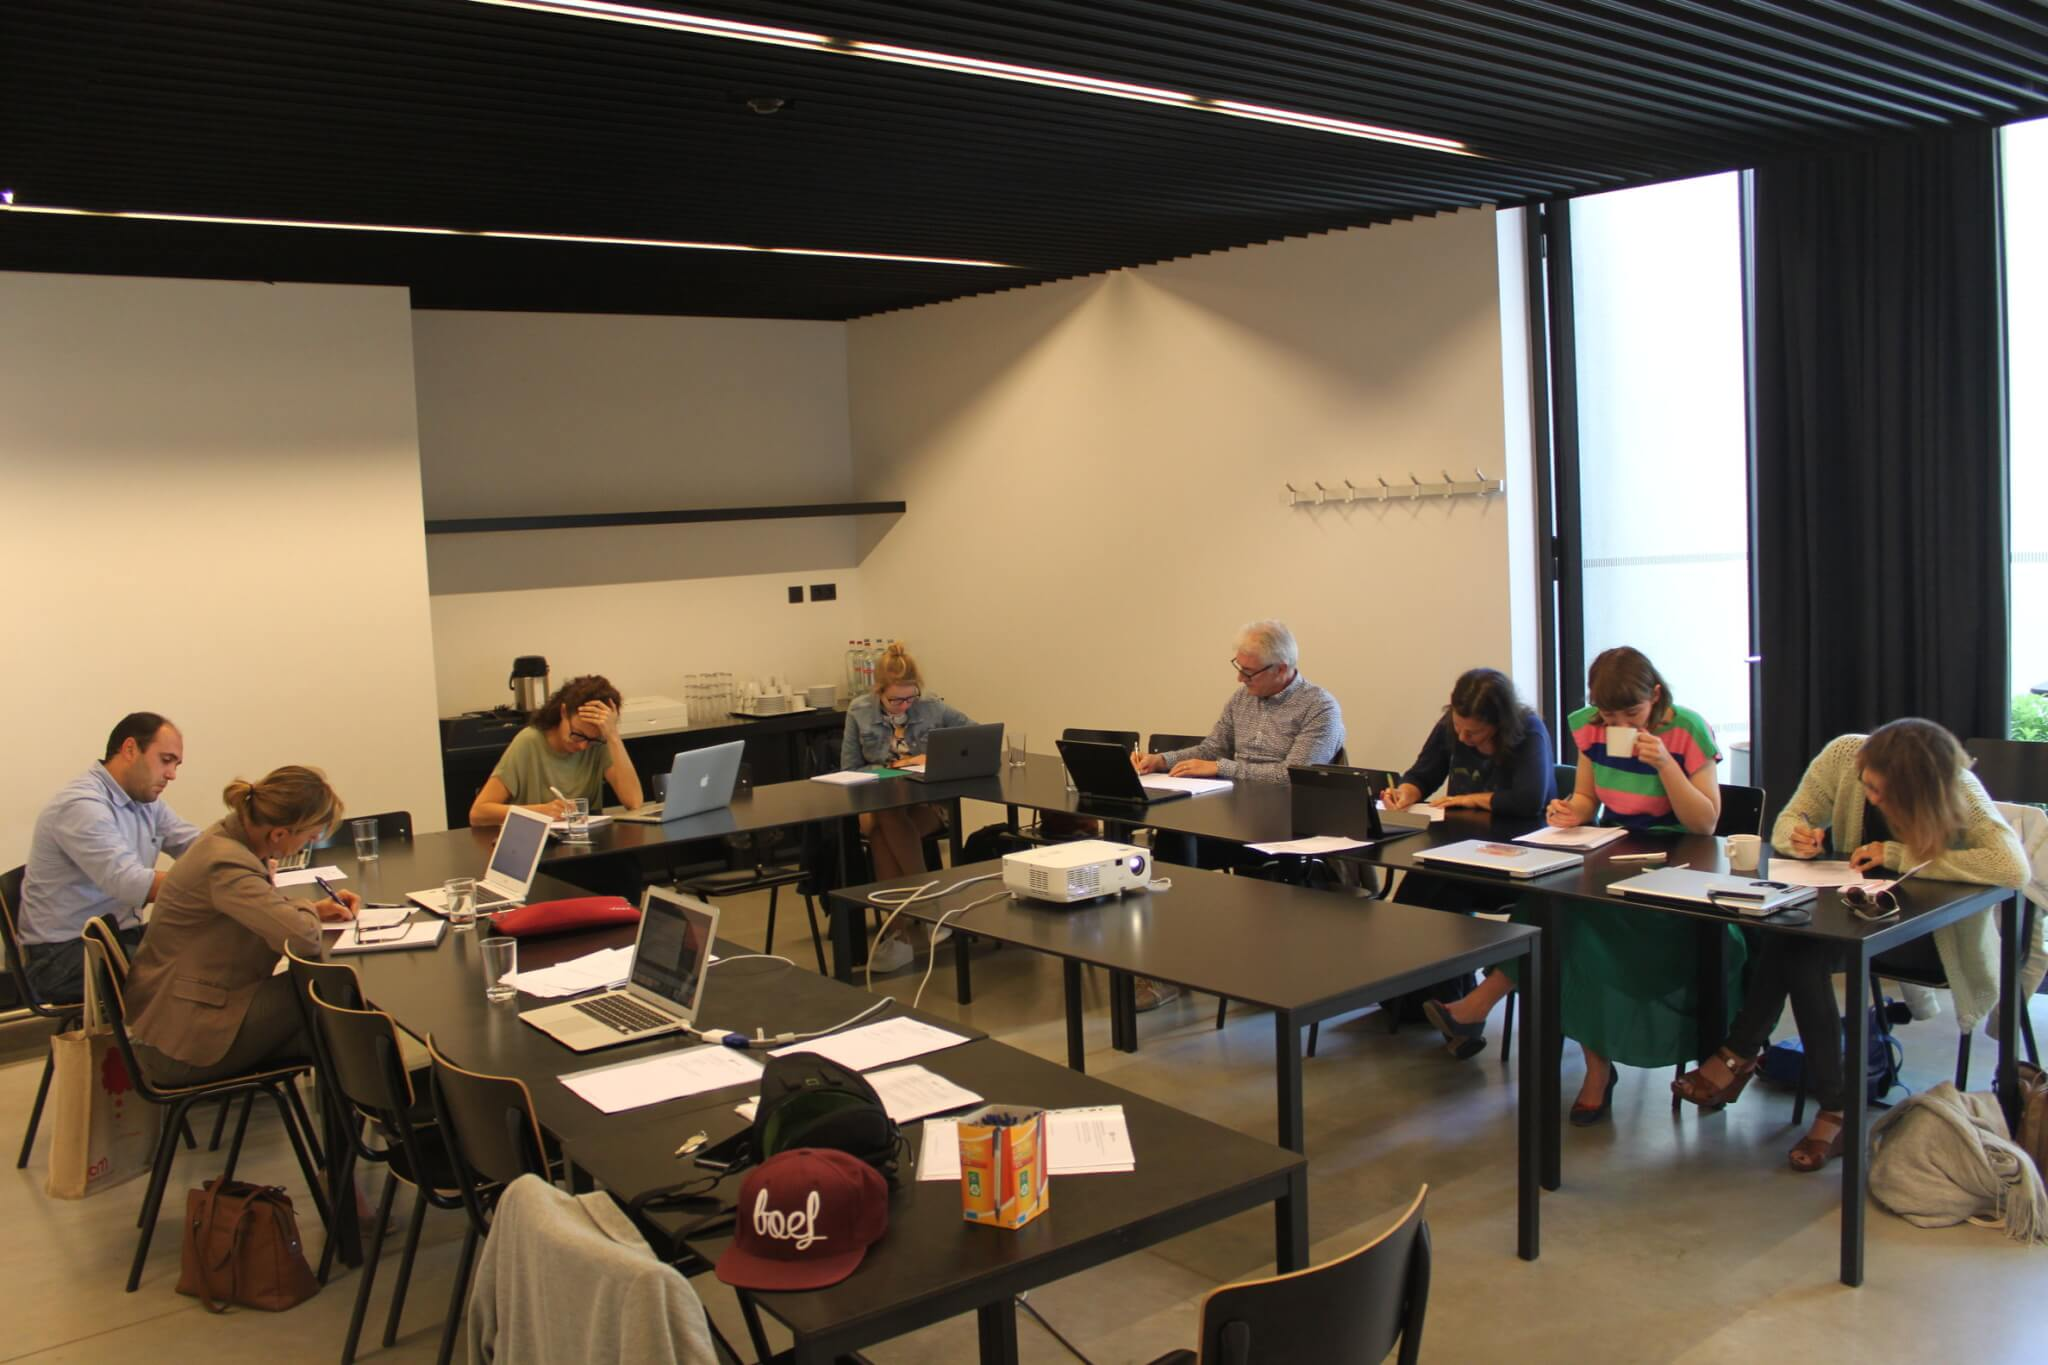 Workshop Personal Branding (15 mei 2017)